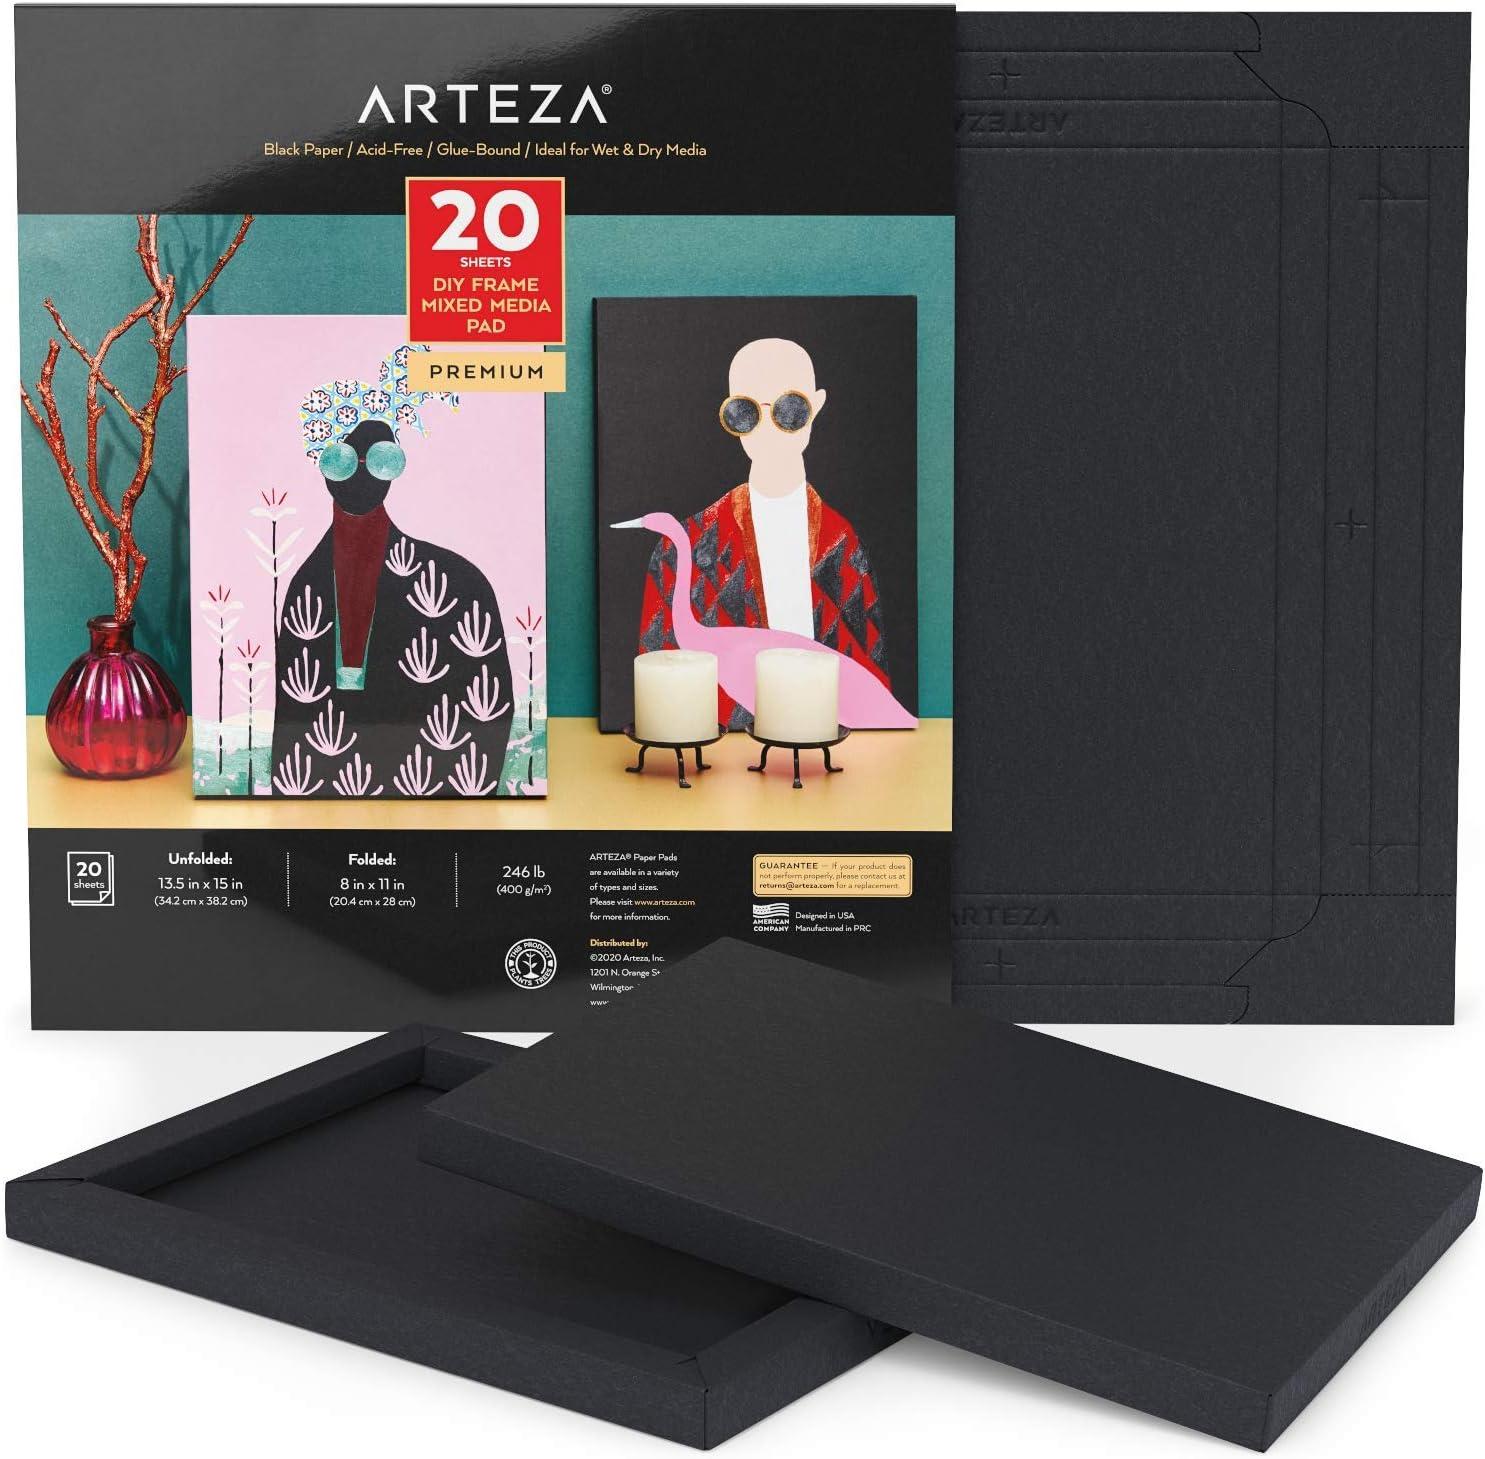 Arteza Mixed Media Paper Finally popular brand Foldable Canvas Inches 11 8 Pad x 20 Minneapolis Mall